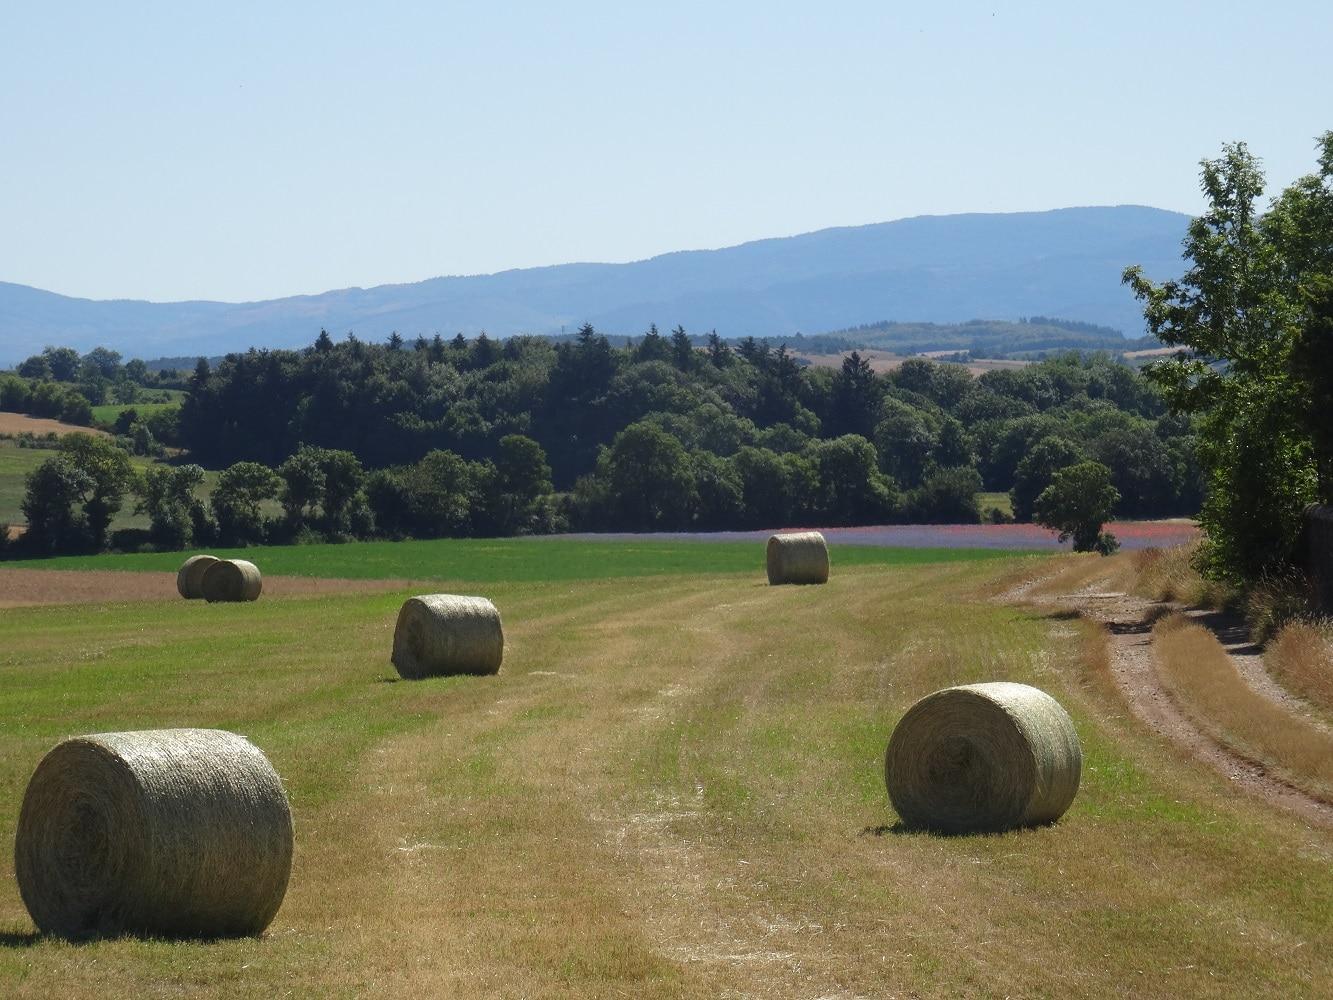 Paysage agricole Sainte Eulalie de Cernon, Aveyron